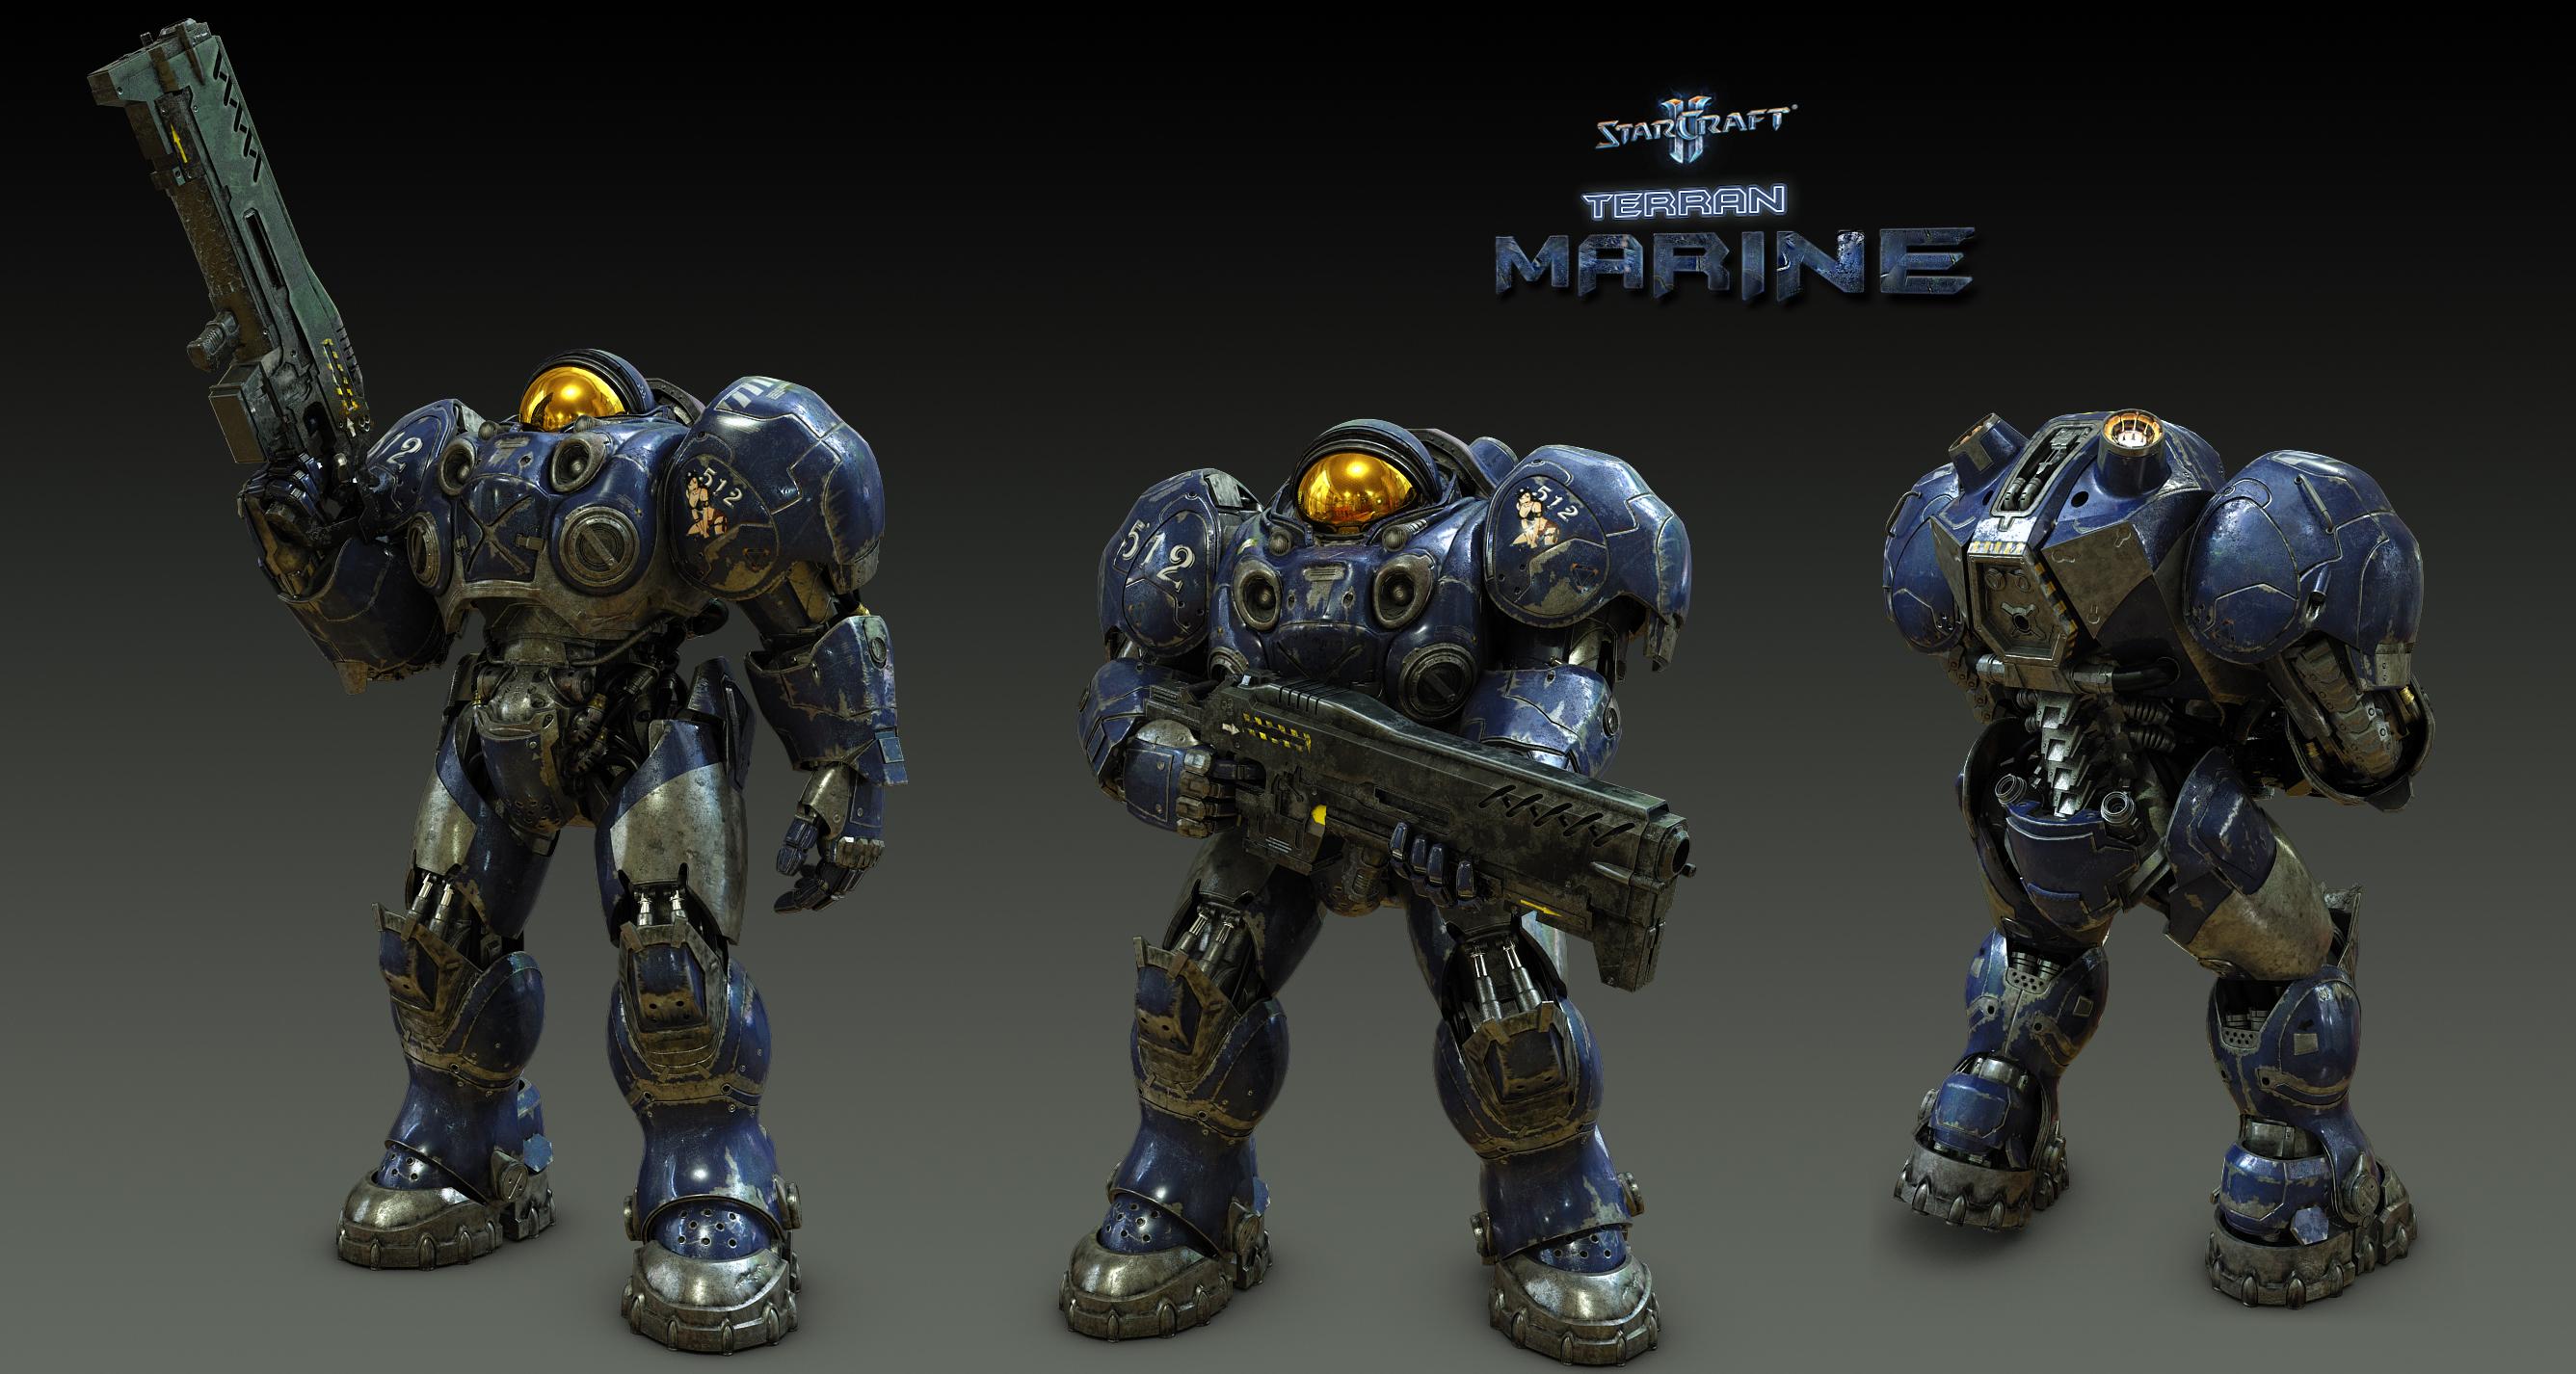 terran marine power armor fallout 4 mod requests the nexus forums. Black Bedroom Furniture Sets. Home Design Ideas